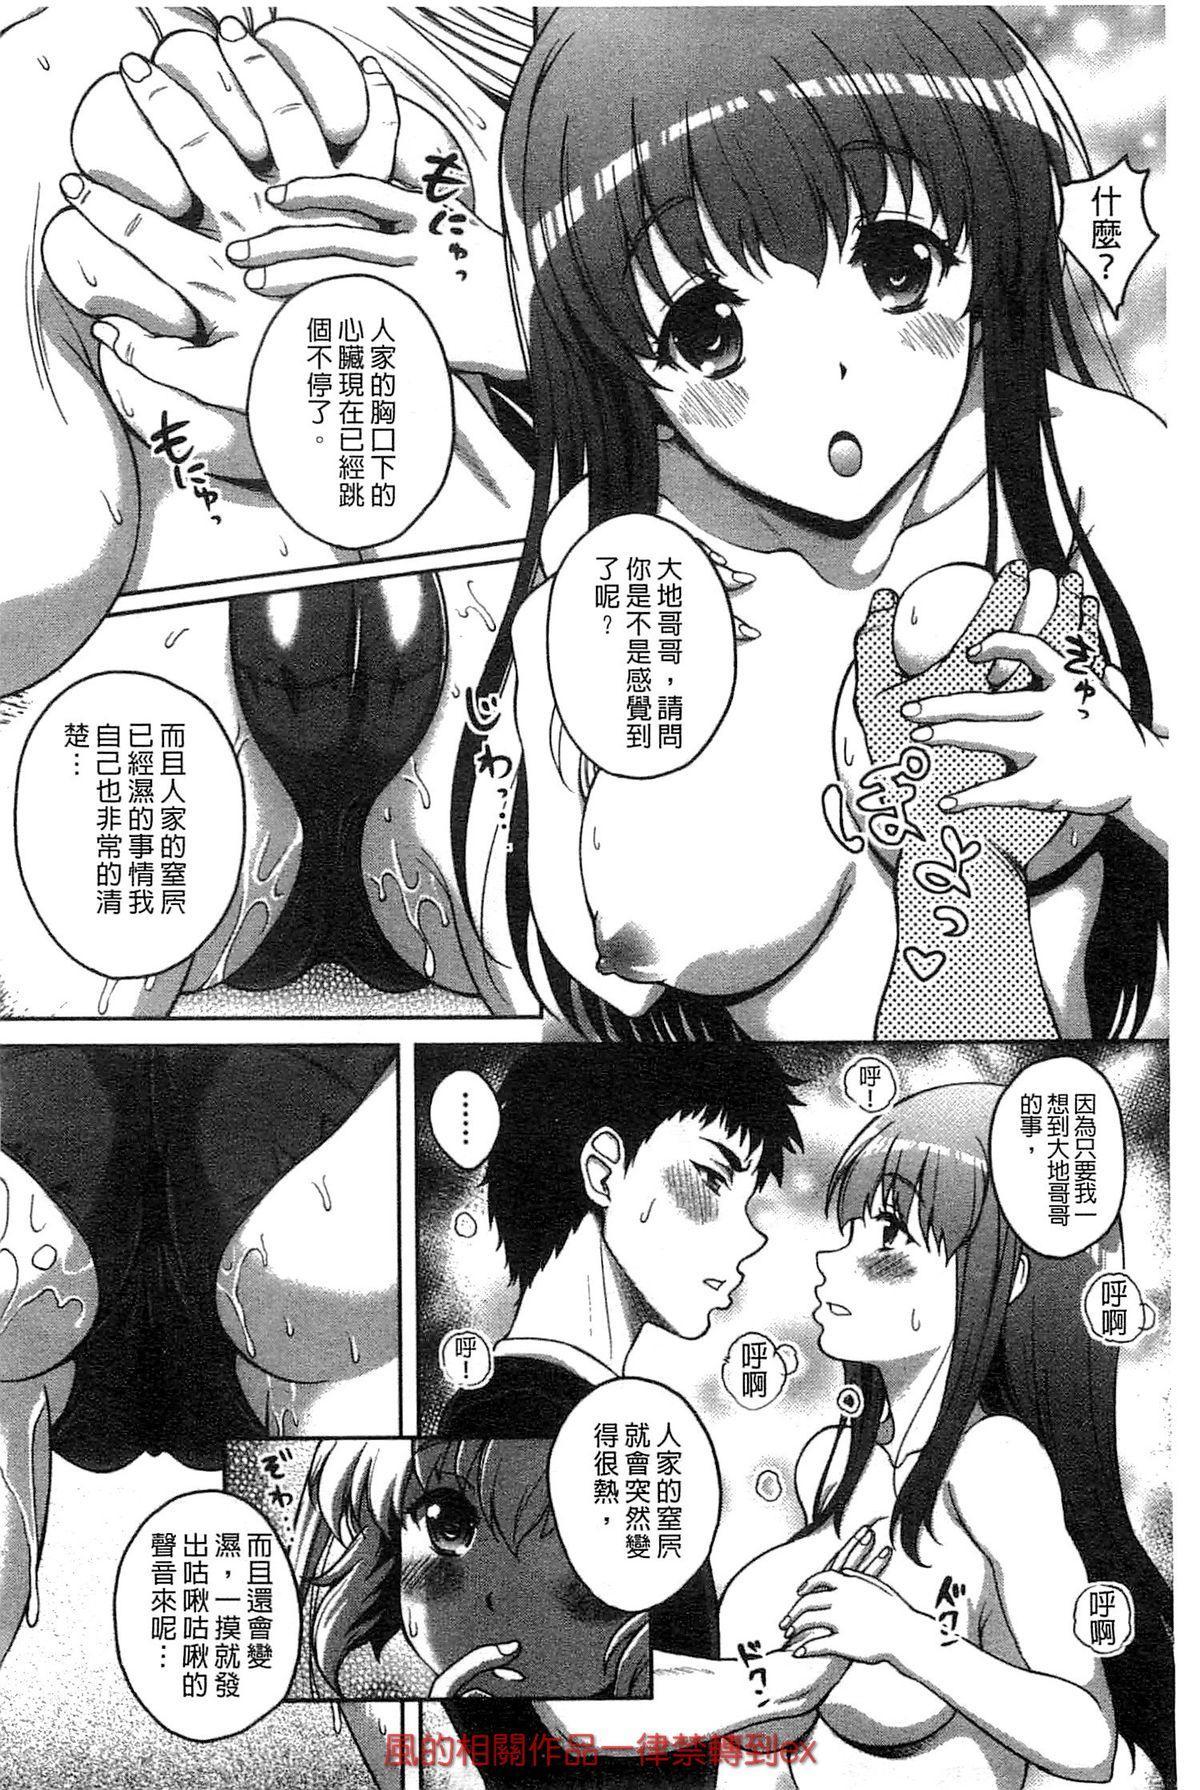 Hajimete nan da kara 134